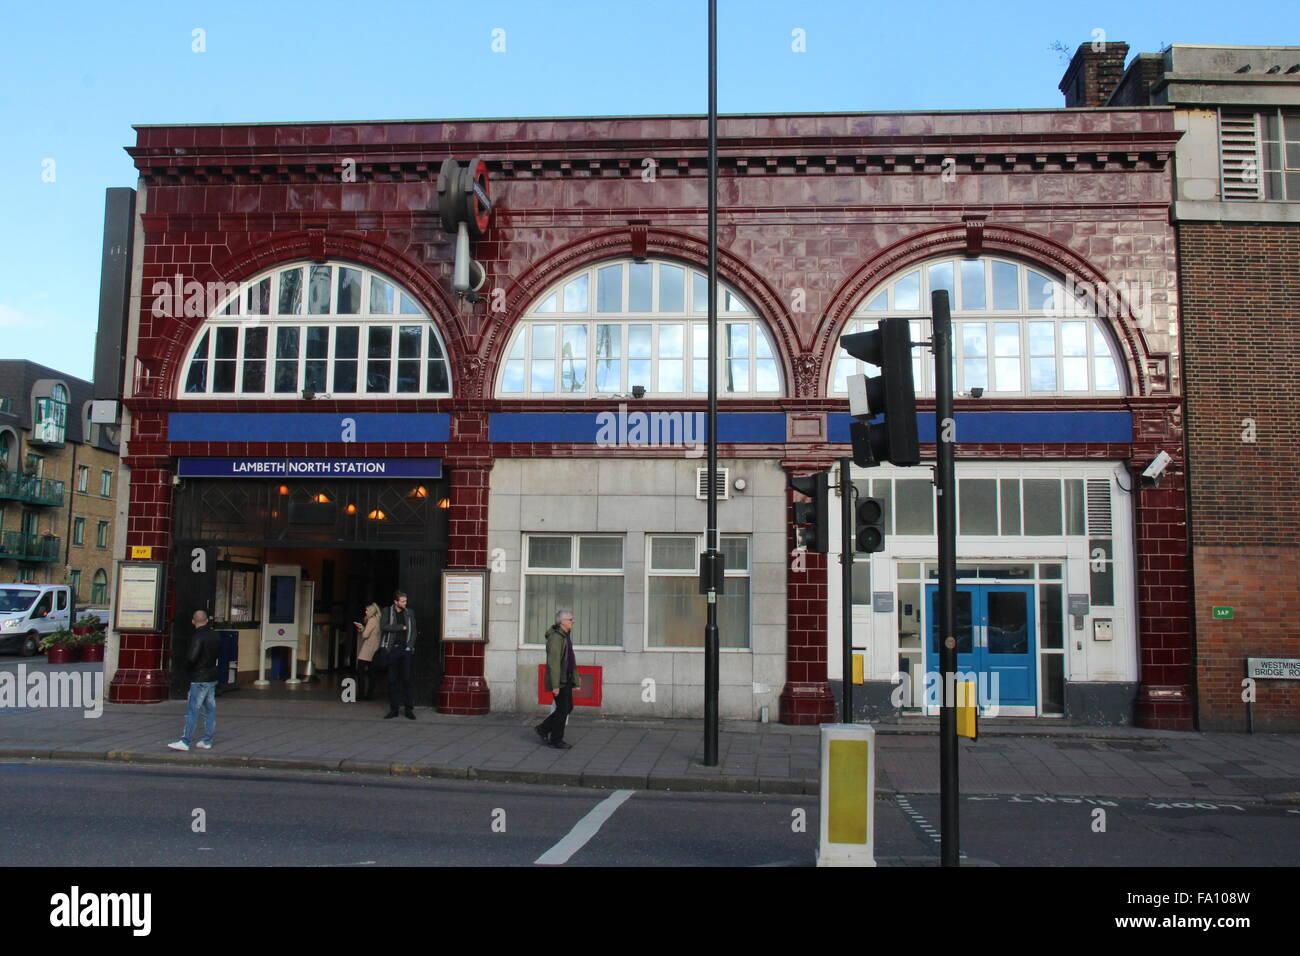 LAMBETH NORTH UNDERGROUND STATION IN LONDON UK - Stock Image